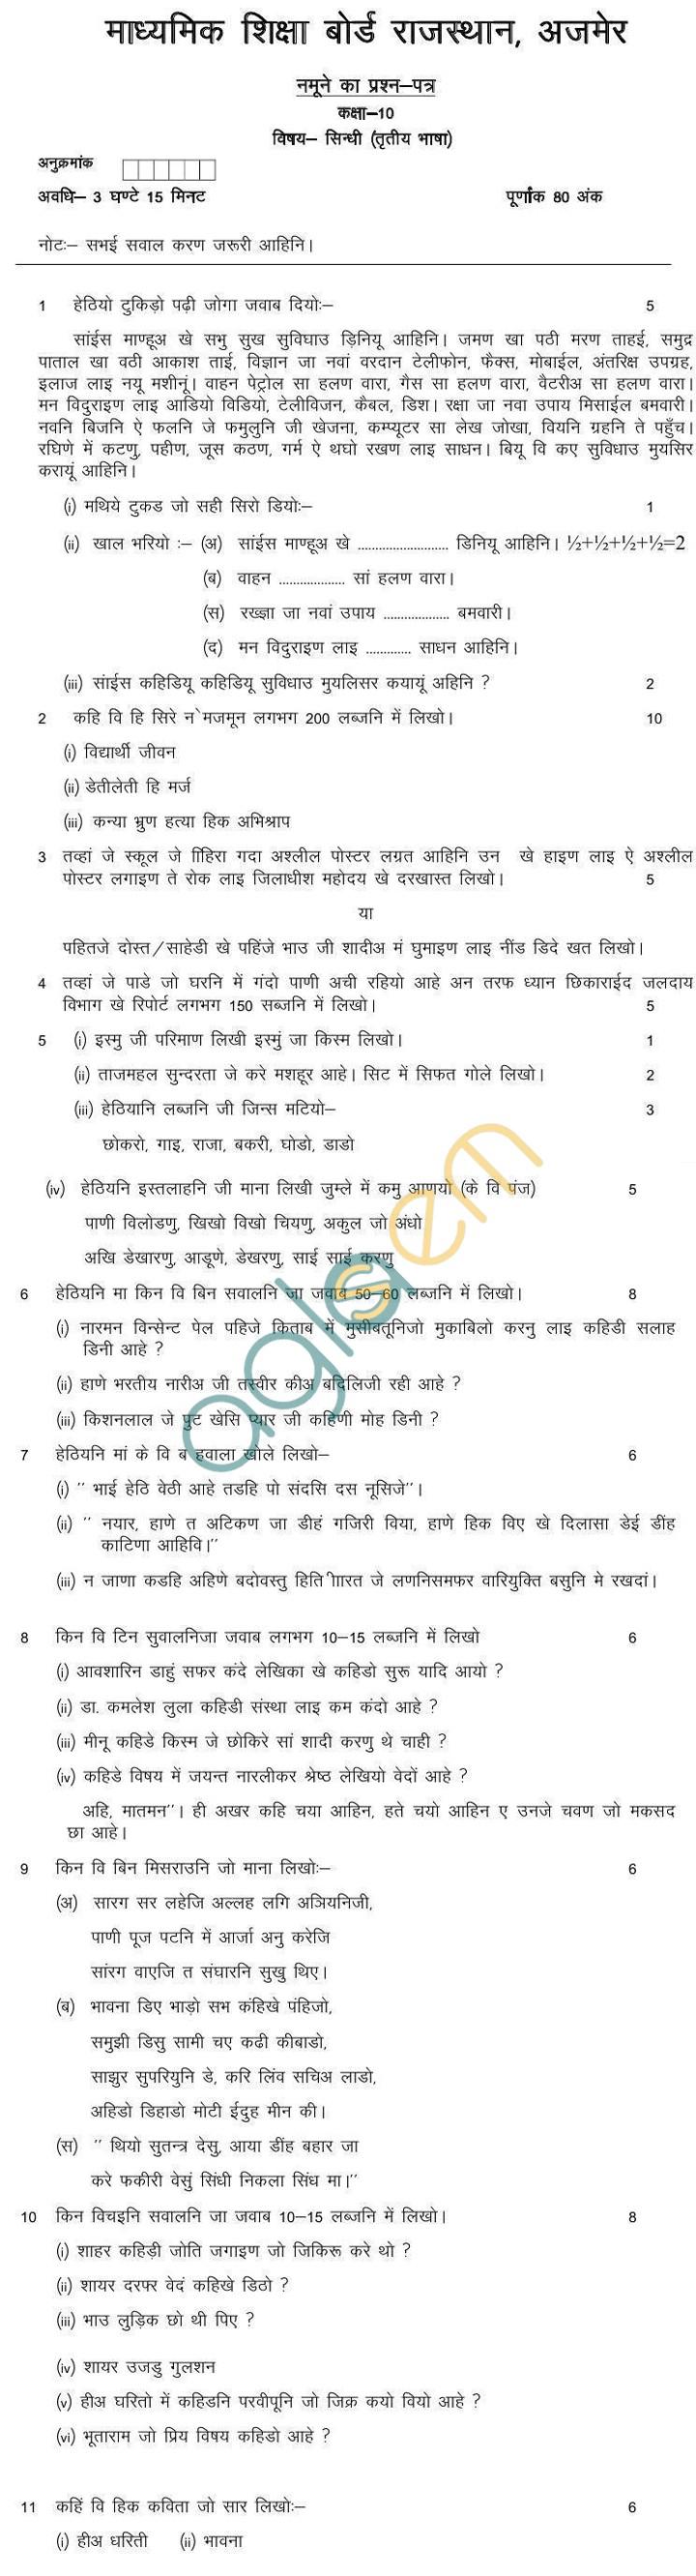 Rajasthan Board Class 10Sindhi T. L.Model Question Paper